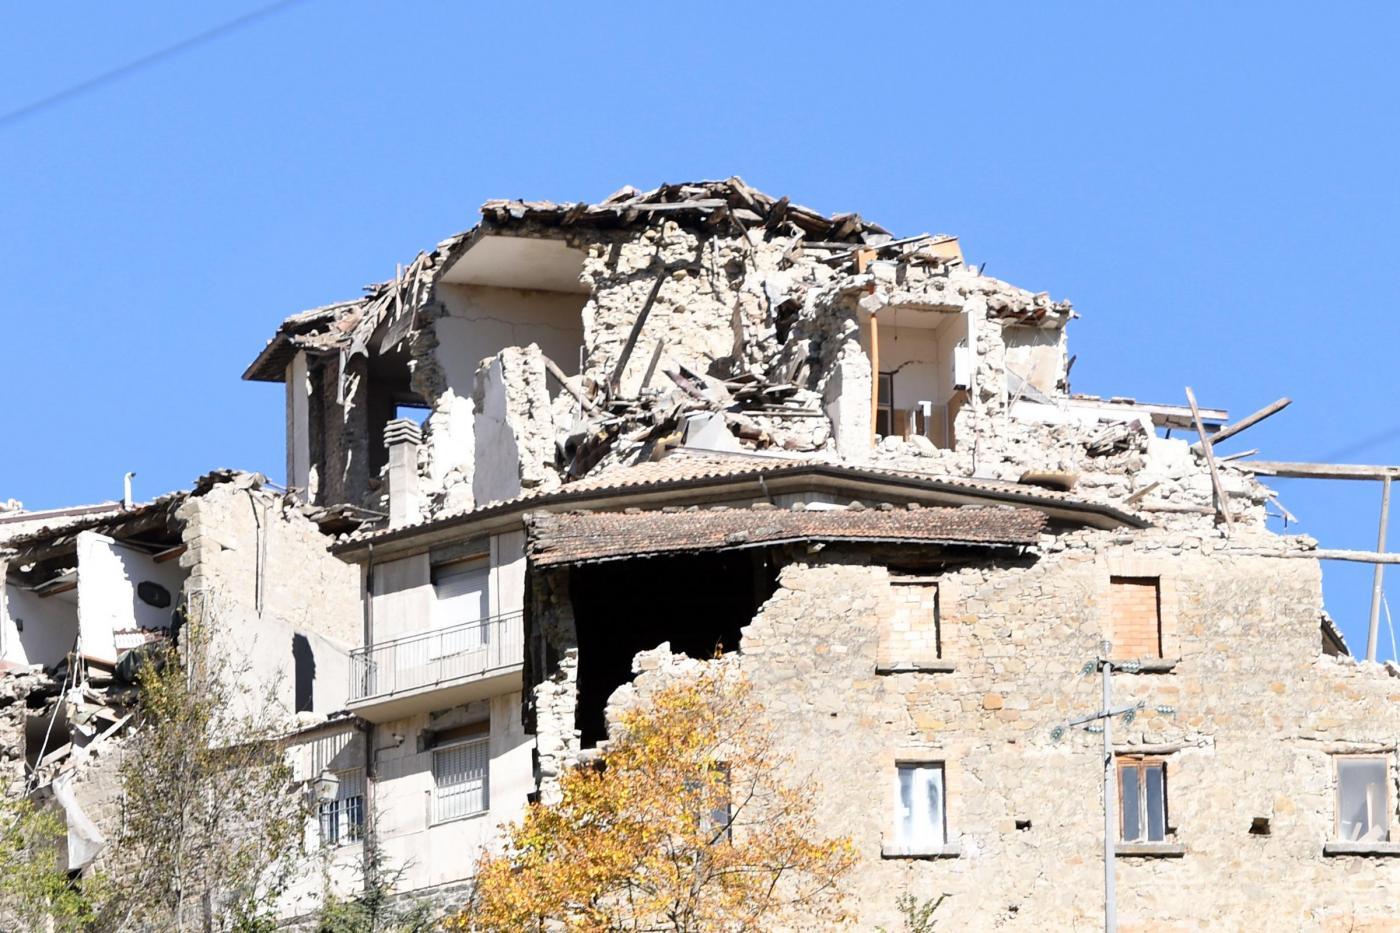 Terremoto, nuove scosse in centro Italia